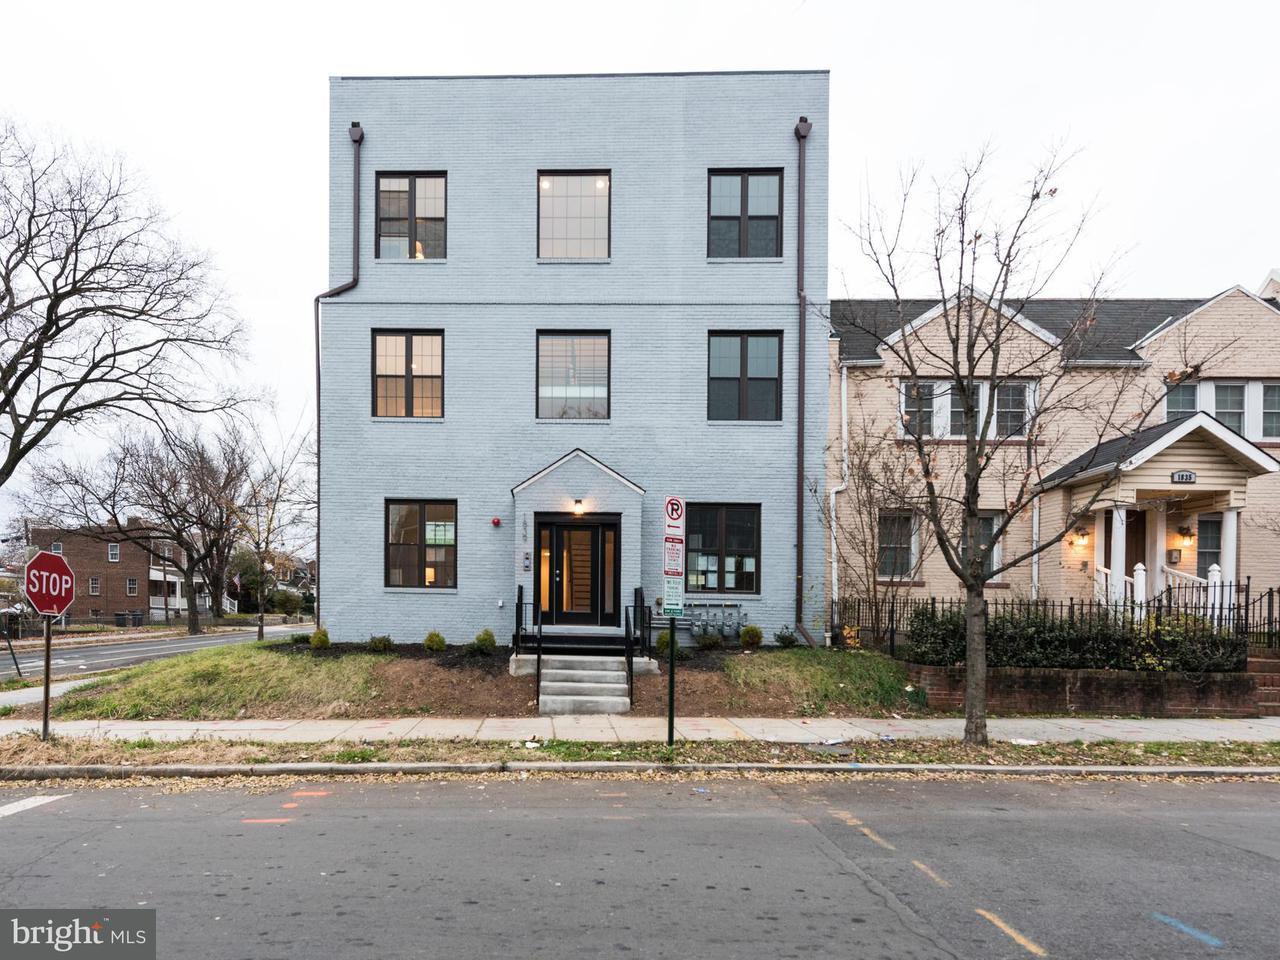 Condominium for Sale at 1839 D St Ne #2 1839 D St Ne #2 Washington, District Of Columbia 20002 United States